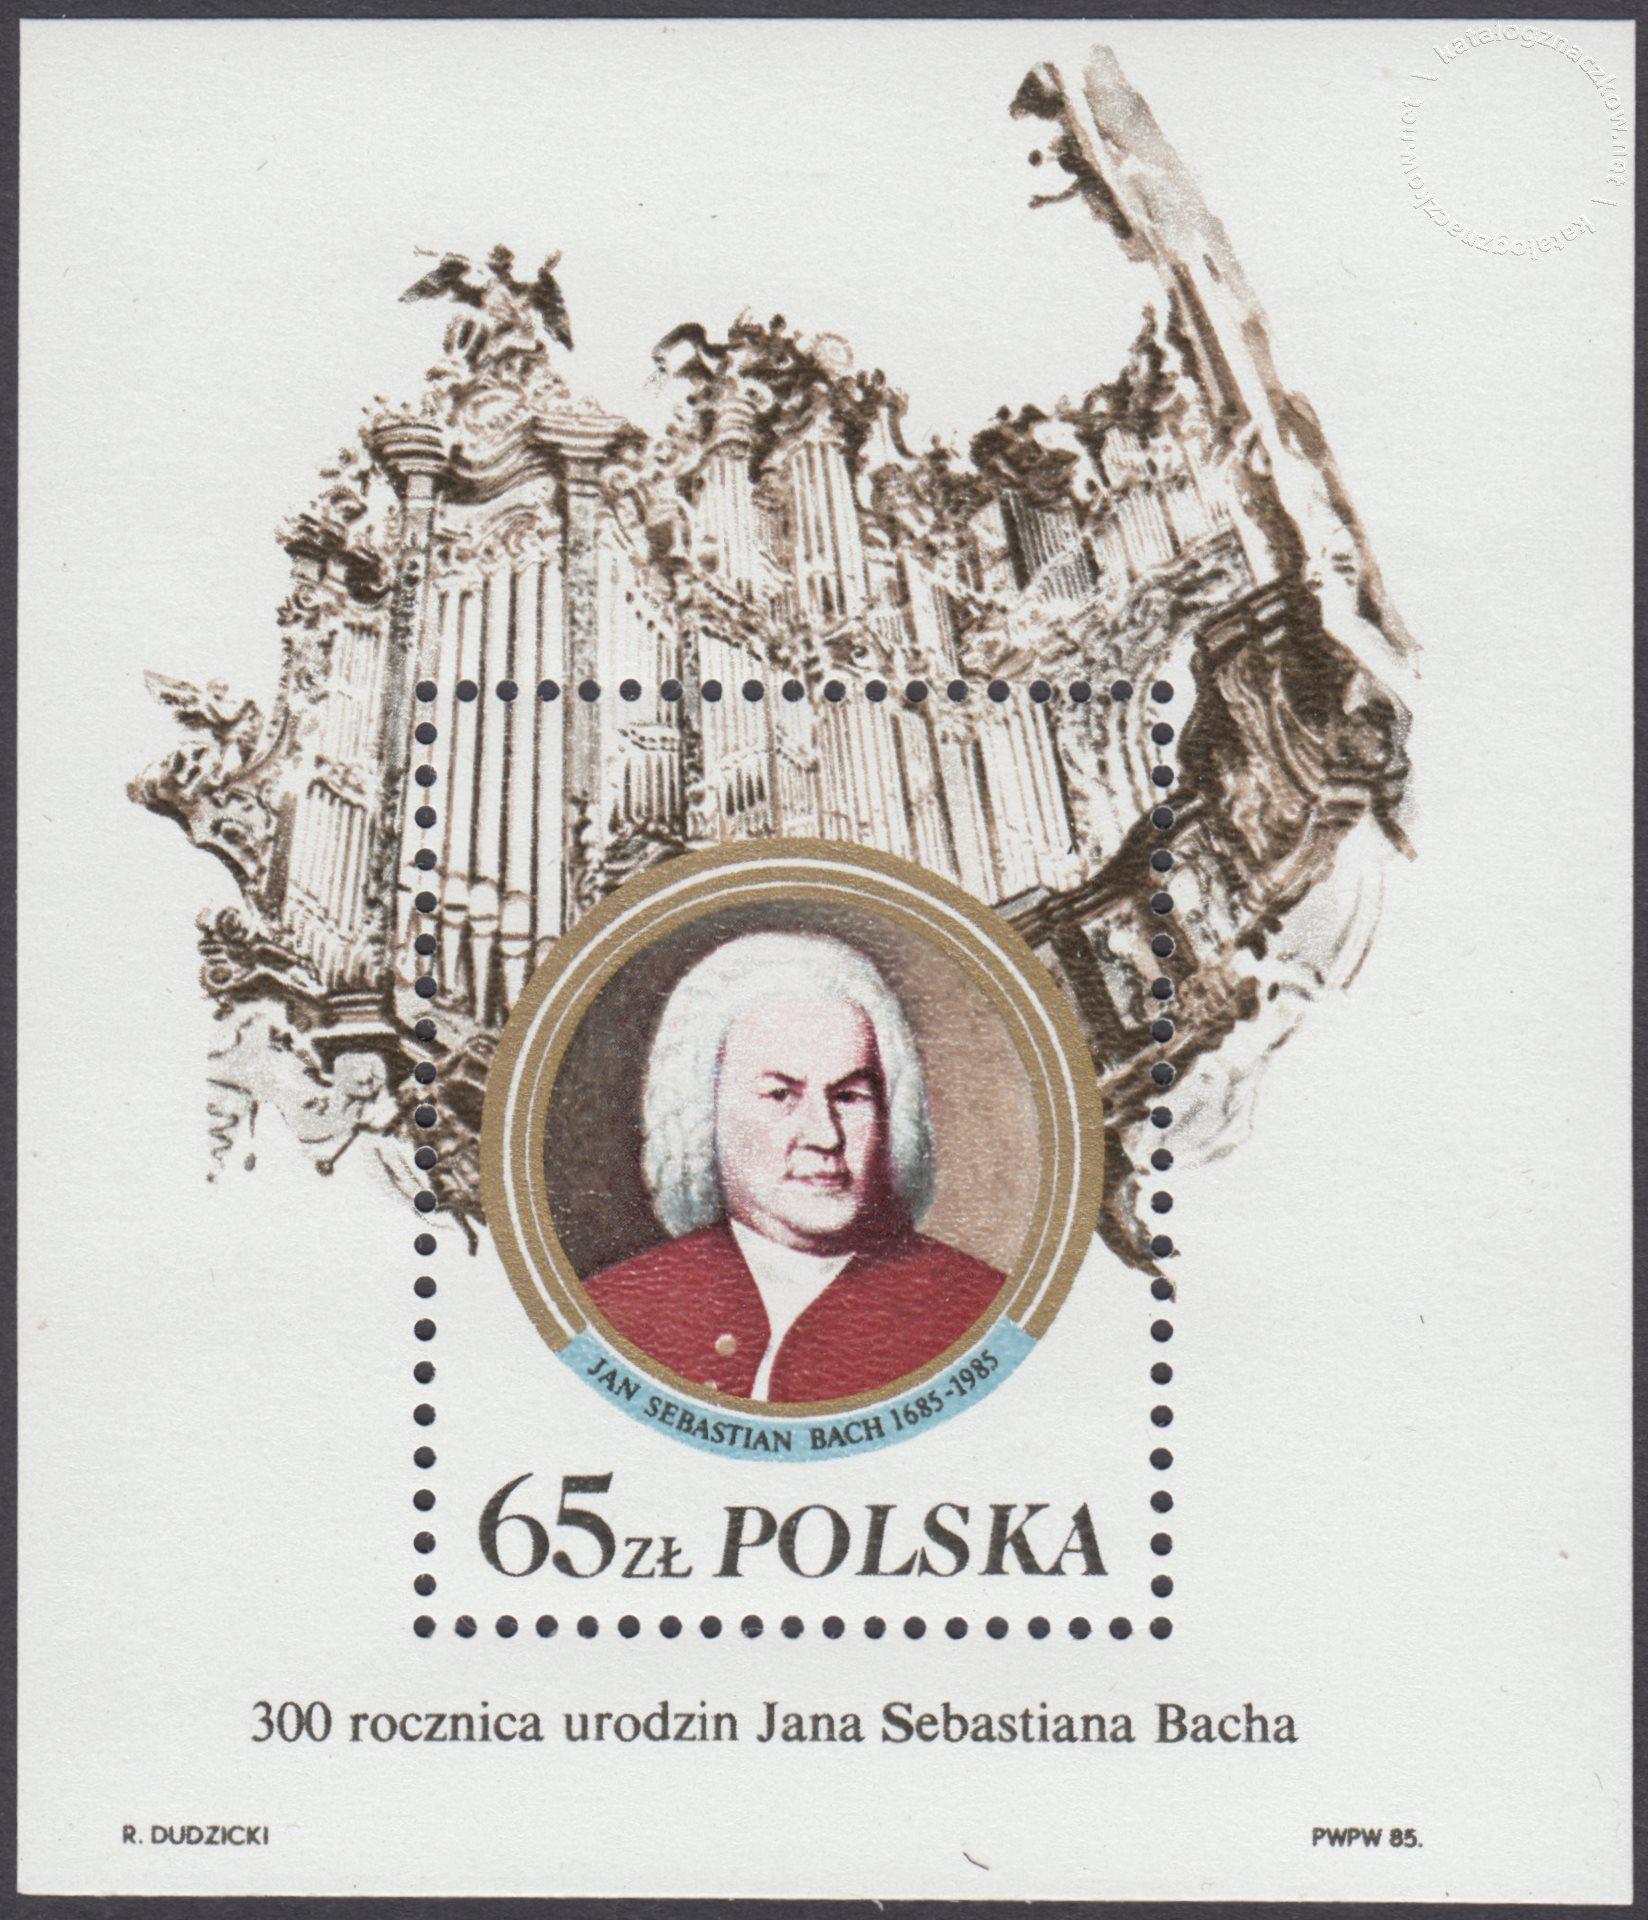 300 rocznica urodzin Jana Sebastiana Bacha – Blok 83II